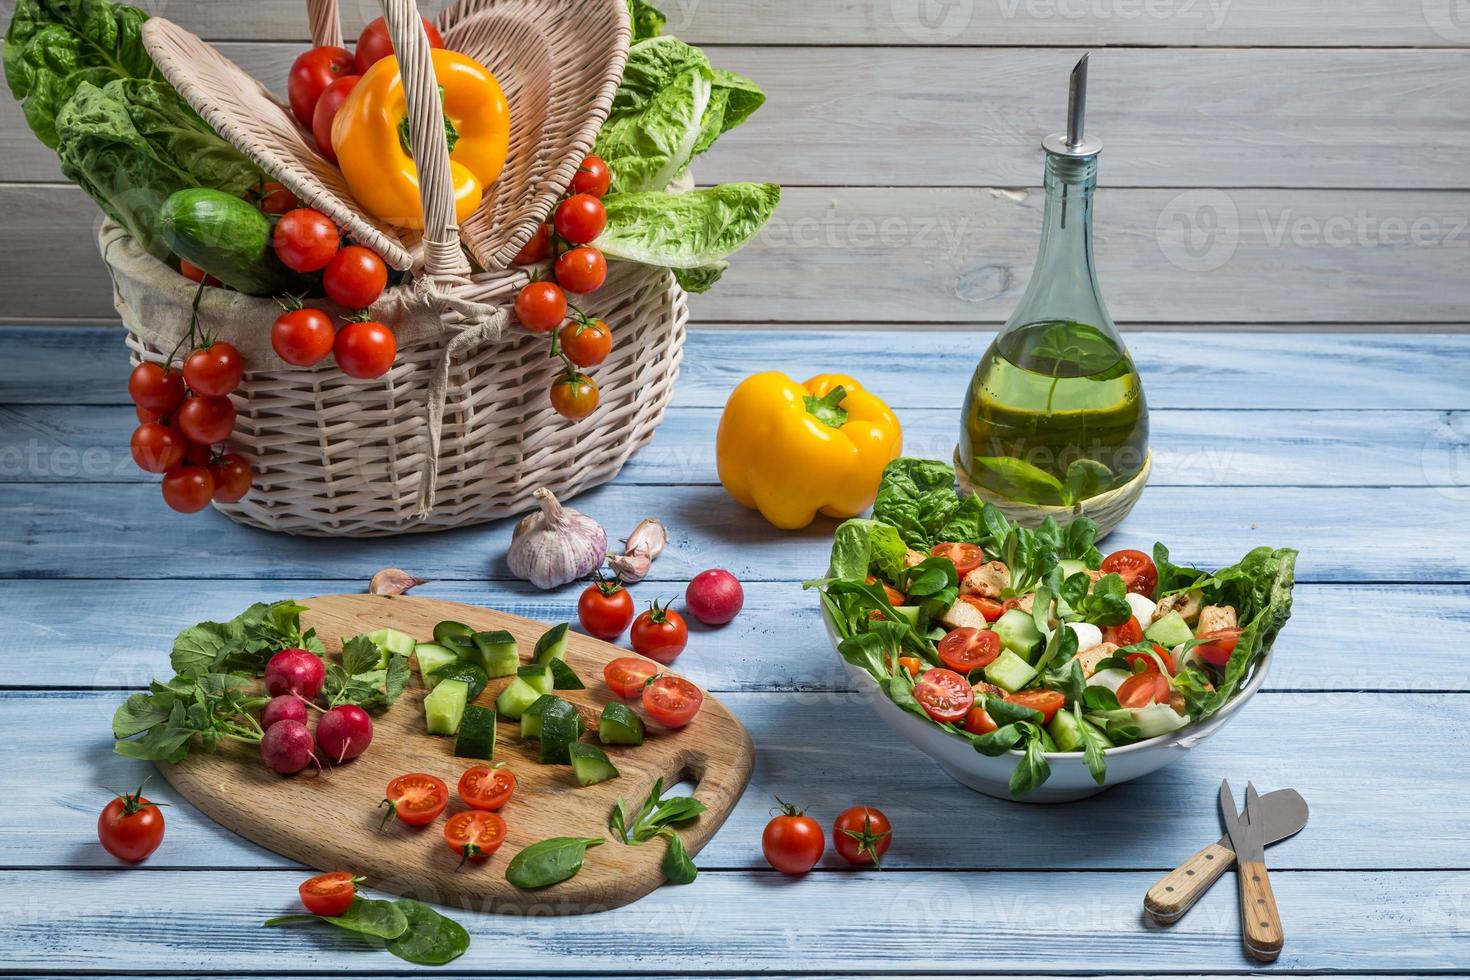 insalata sana a base di verdure fresche foto